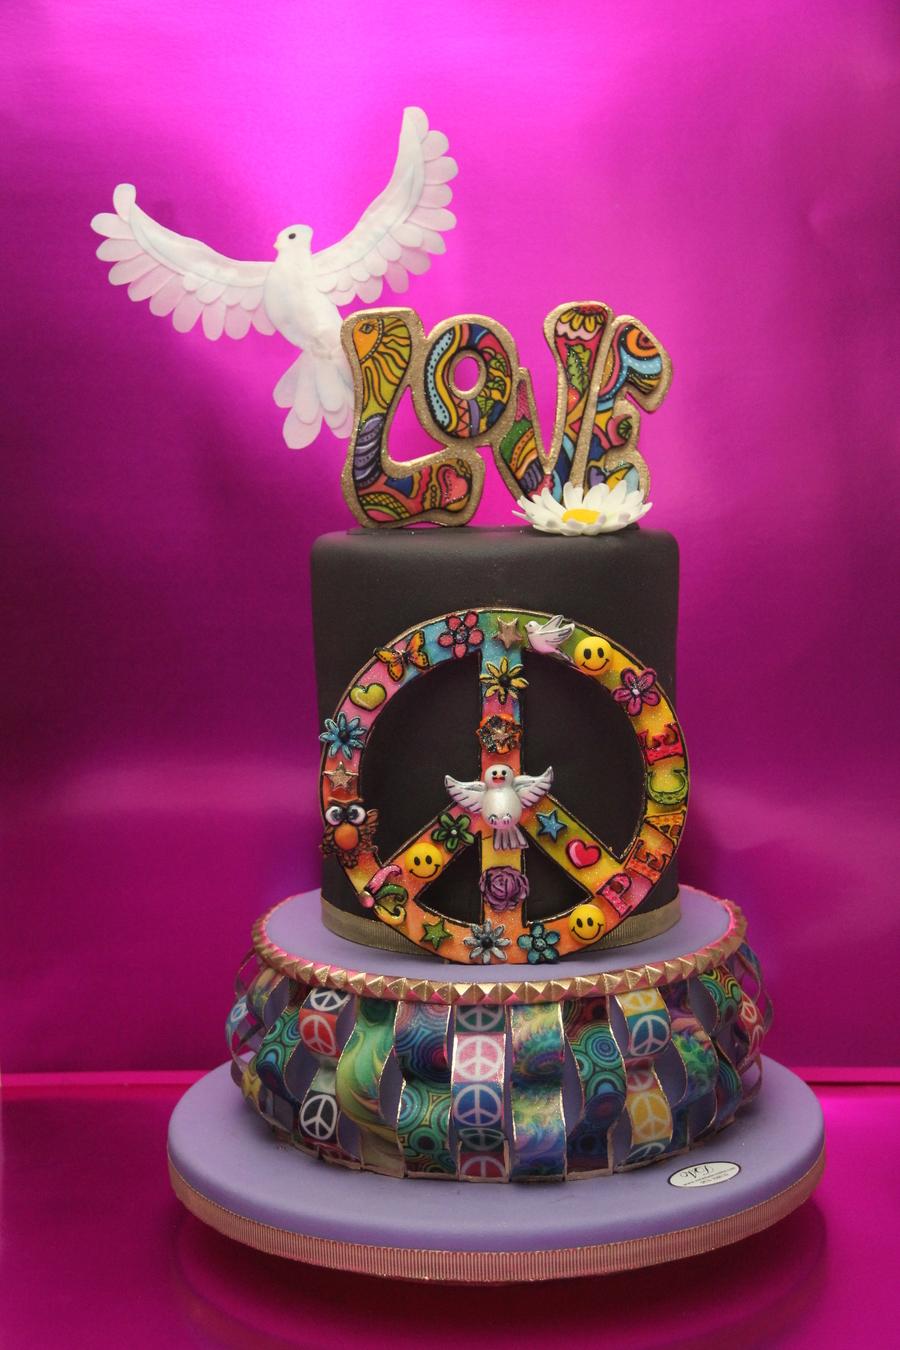 Retro Birthday Cake Word Love And Peace Symbol Made Of